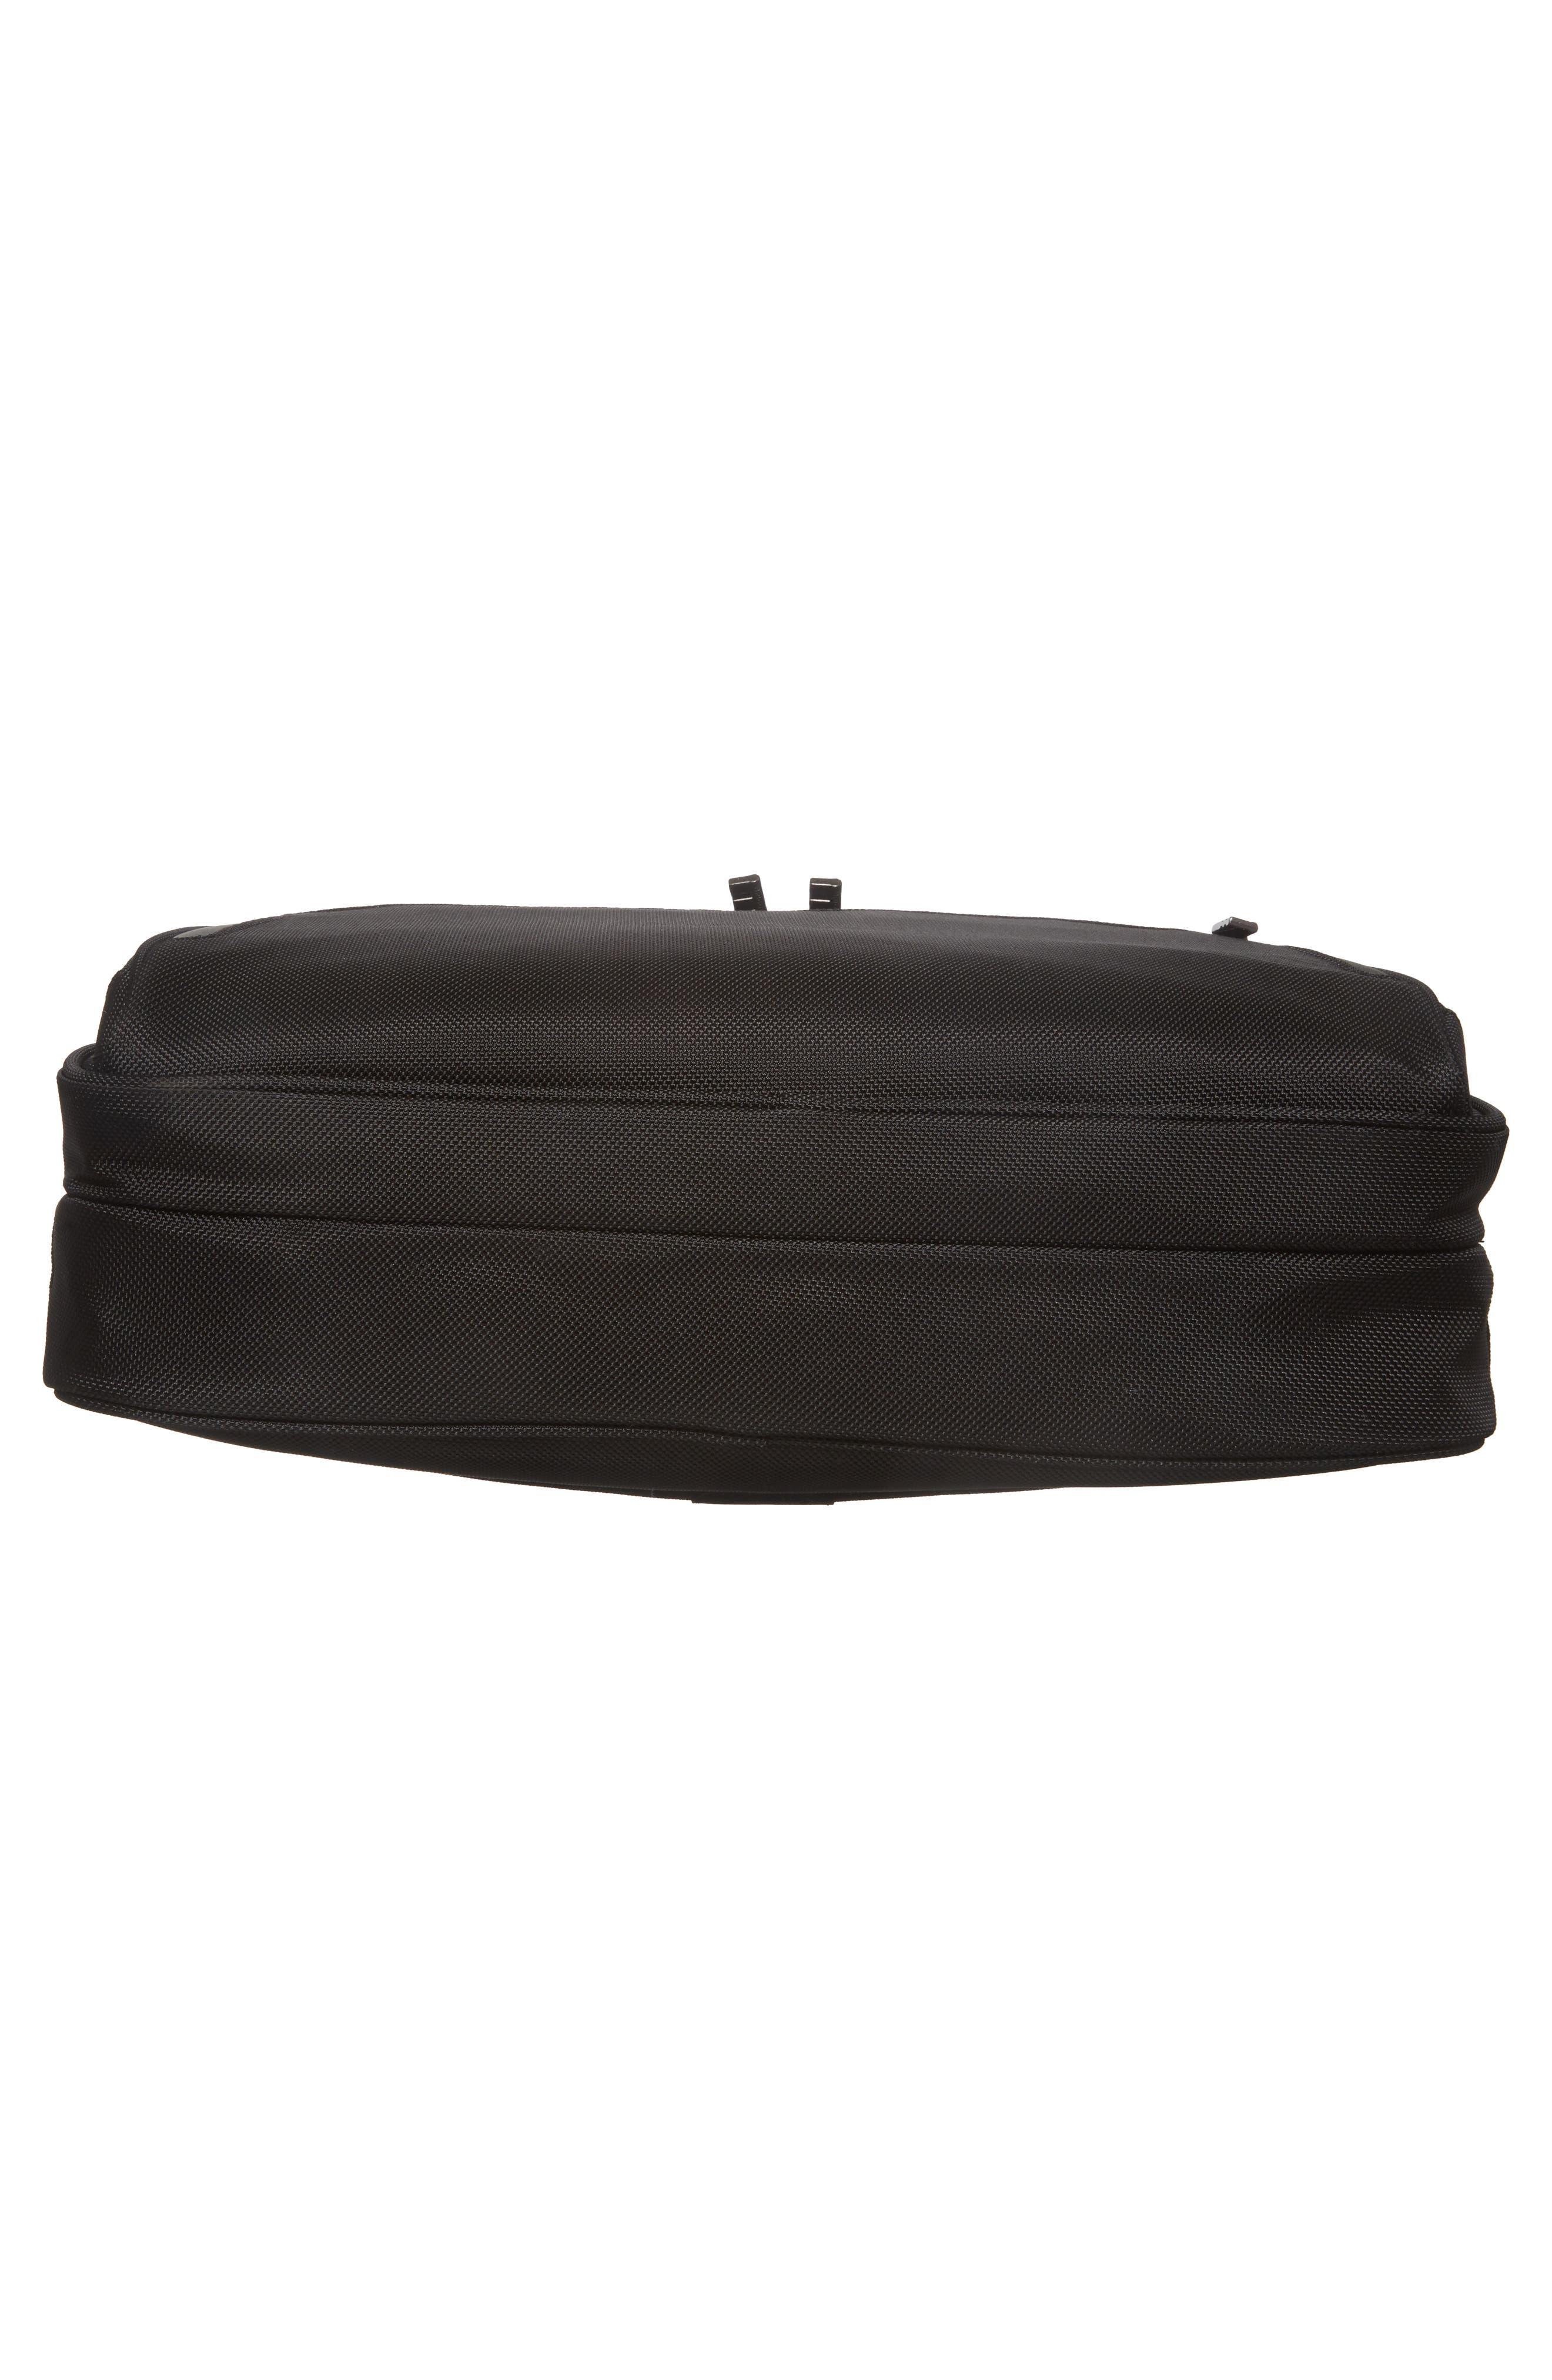 'Medium' Ballistic Nylon Briefcase,                             Alternate thumbnail 6, color,                             Black